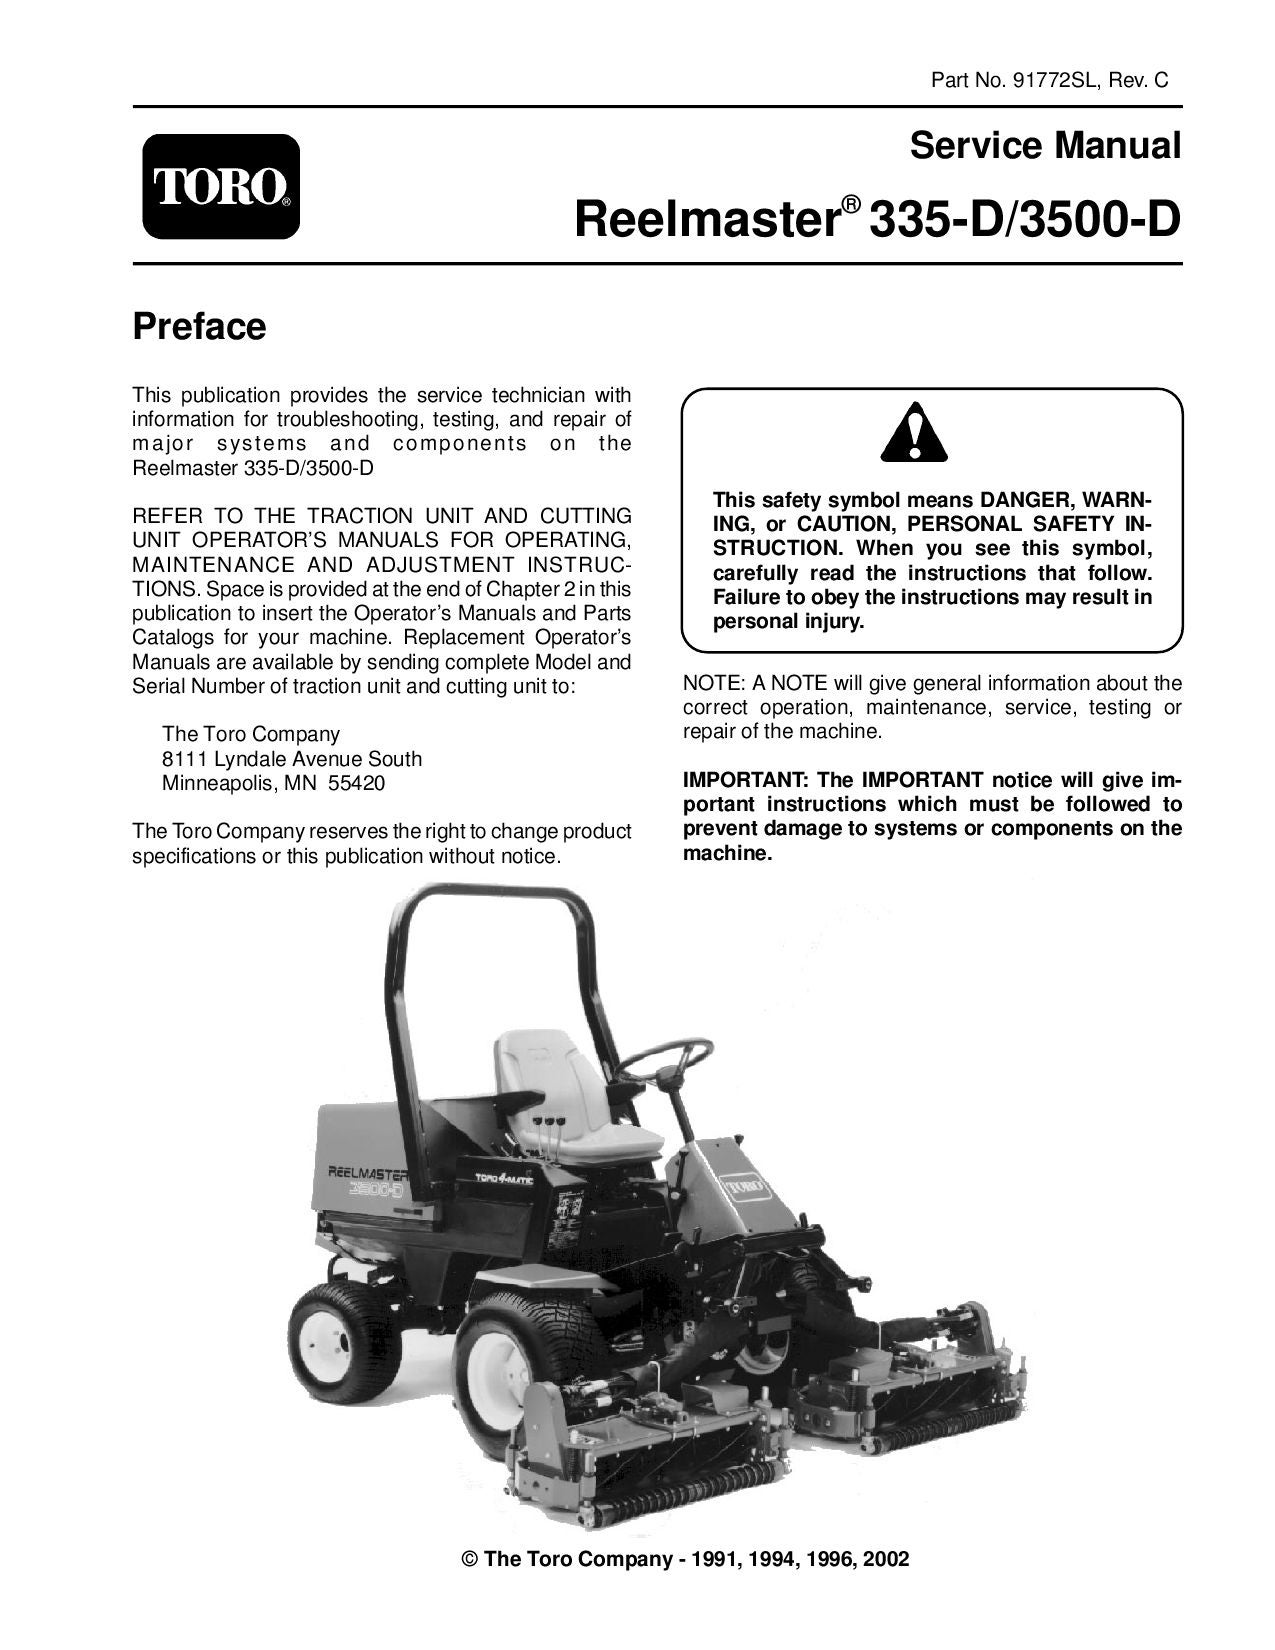 91772sl pdf Reelmaster 335-D/3500-D (Rev C) 2002 by